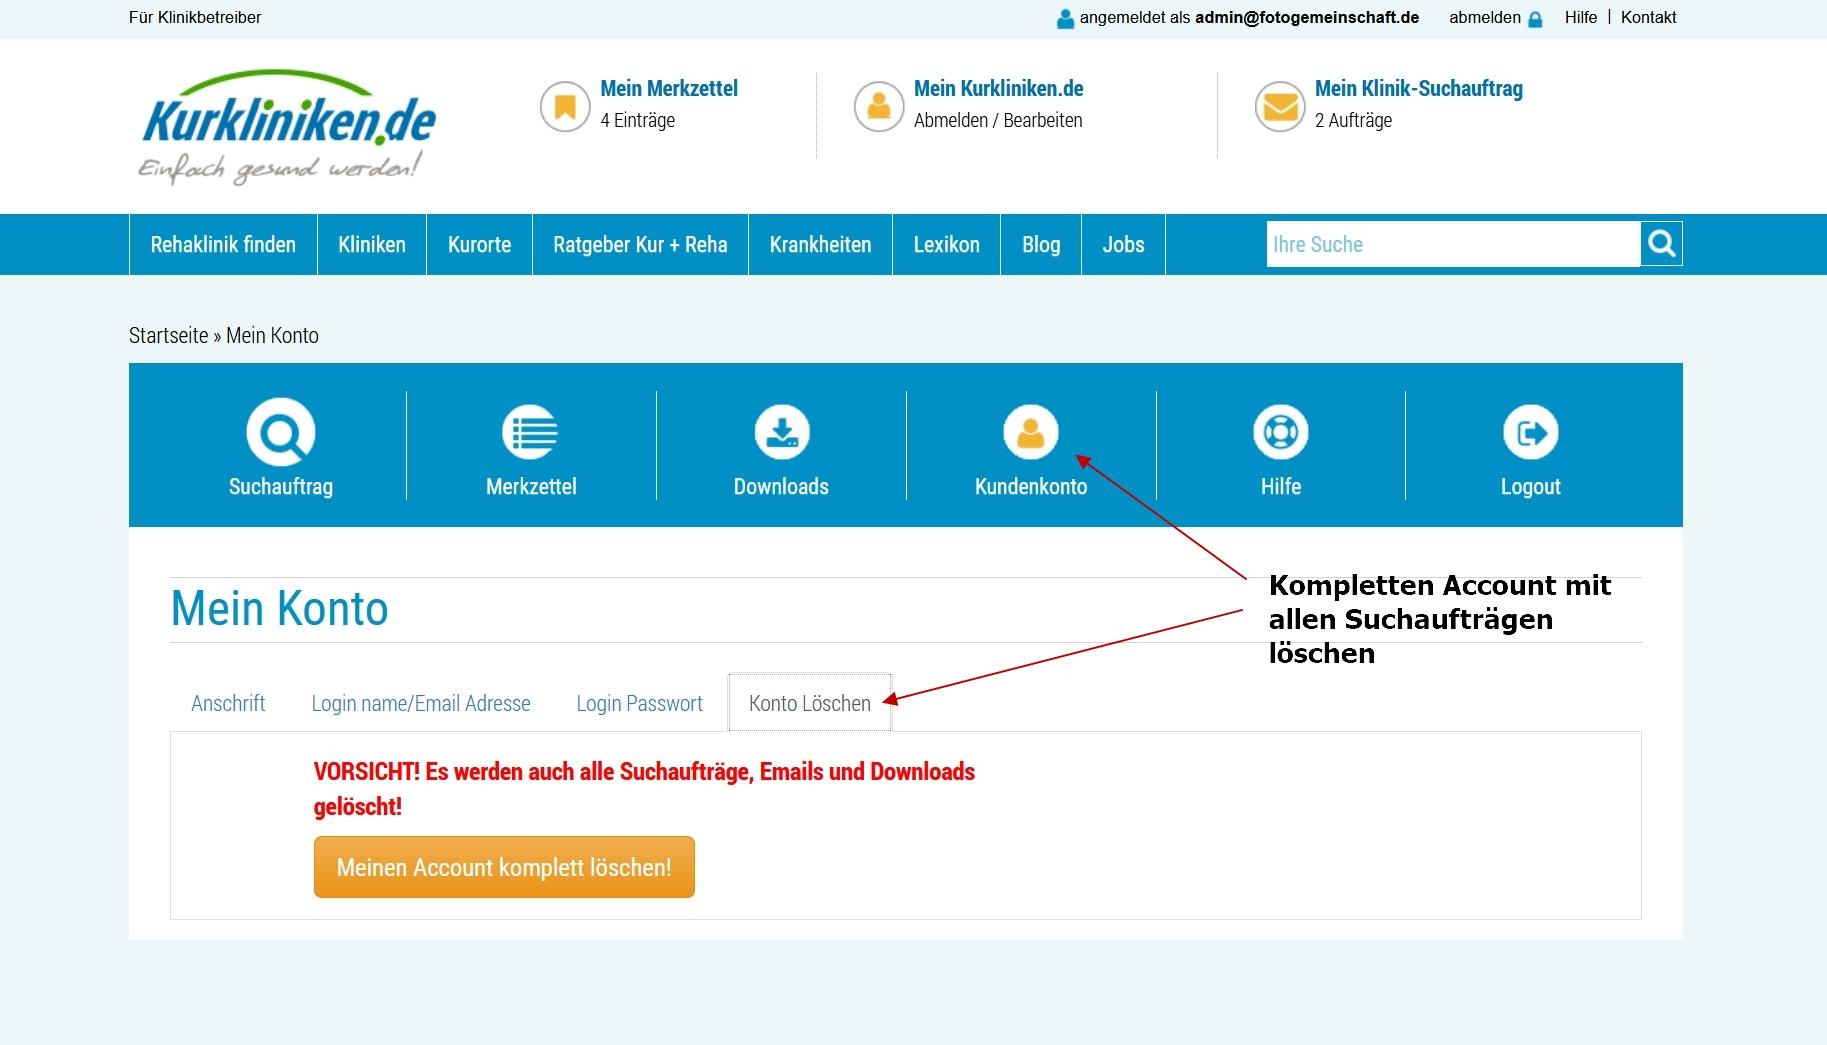 Kurkliniken.de: Account löschen